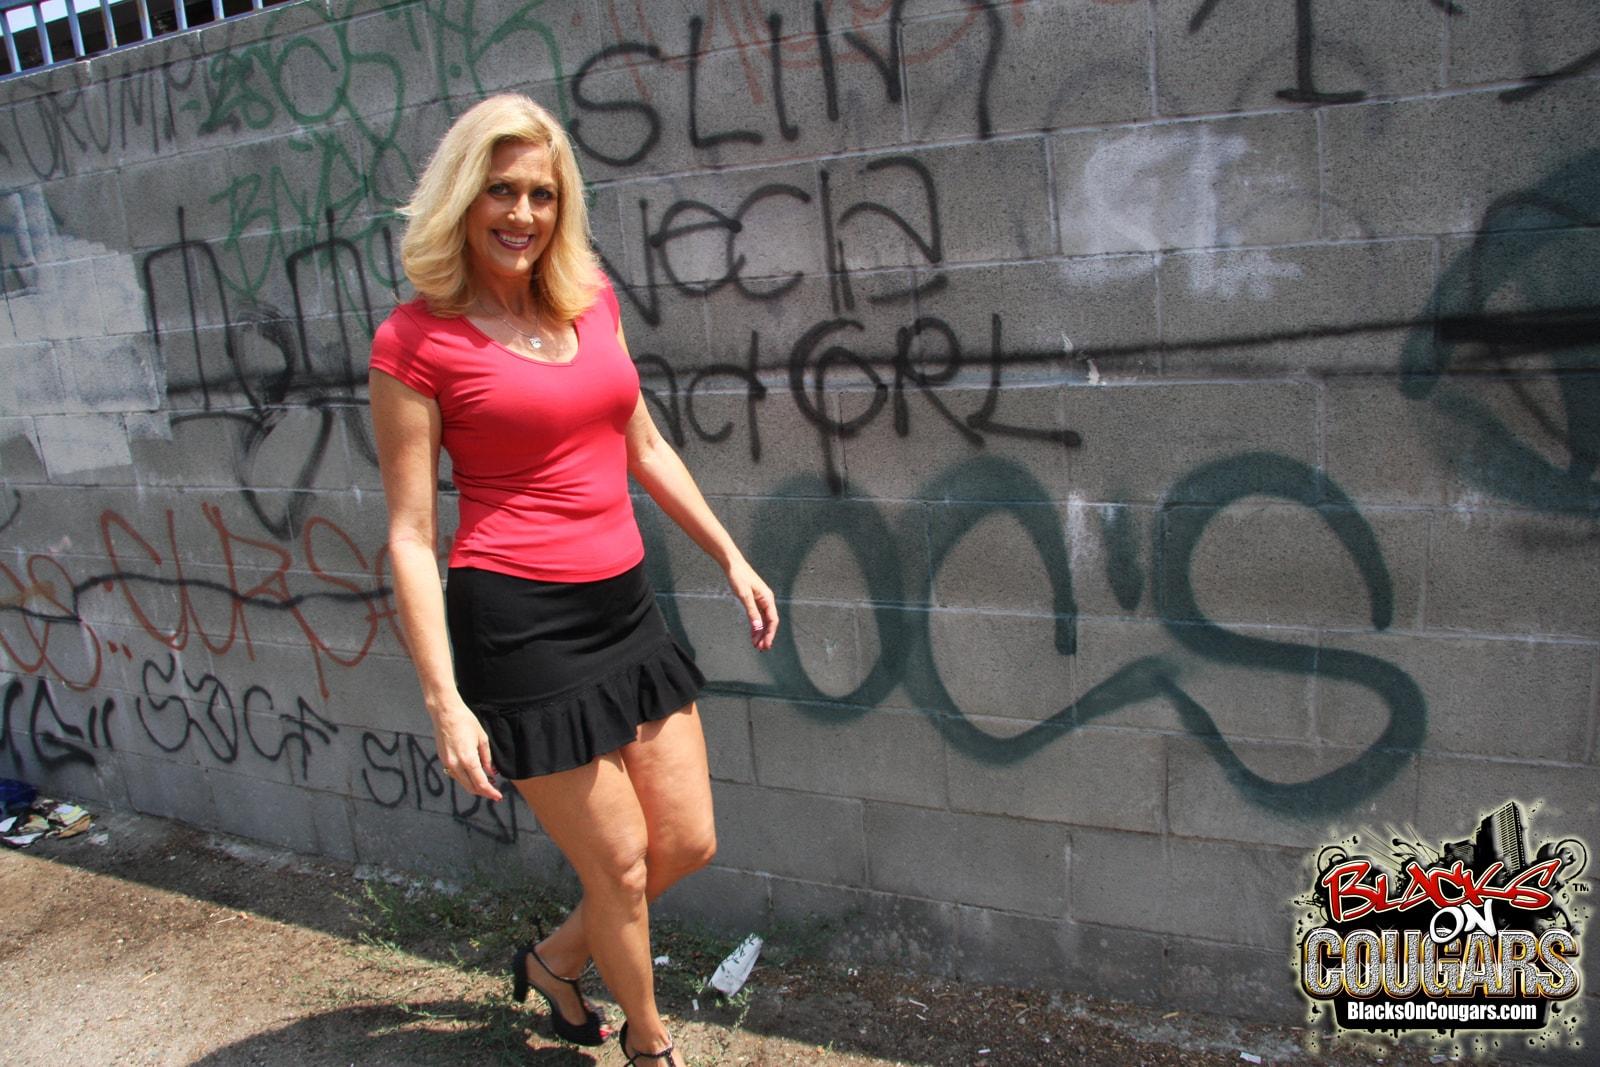 Dogfart '- Blacks On Cougars' starring Dana Devine (Photo 1)